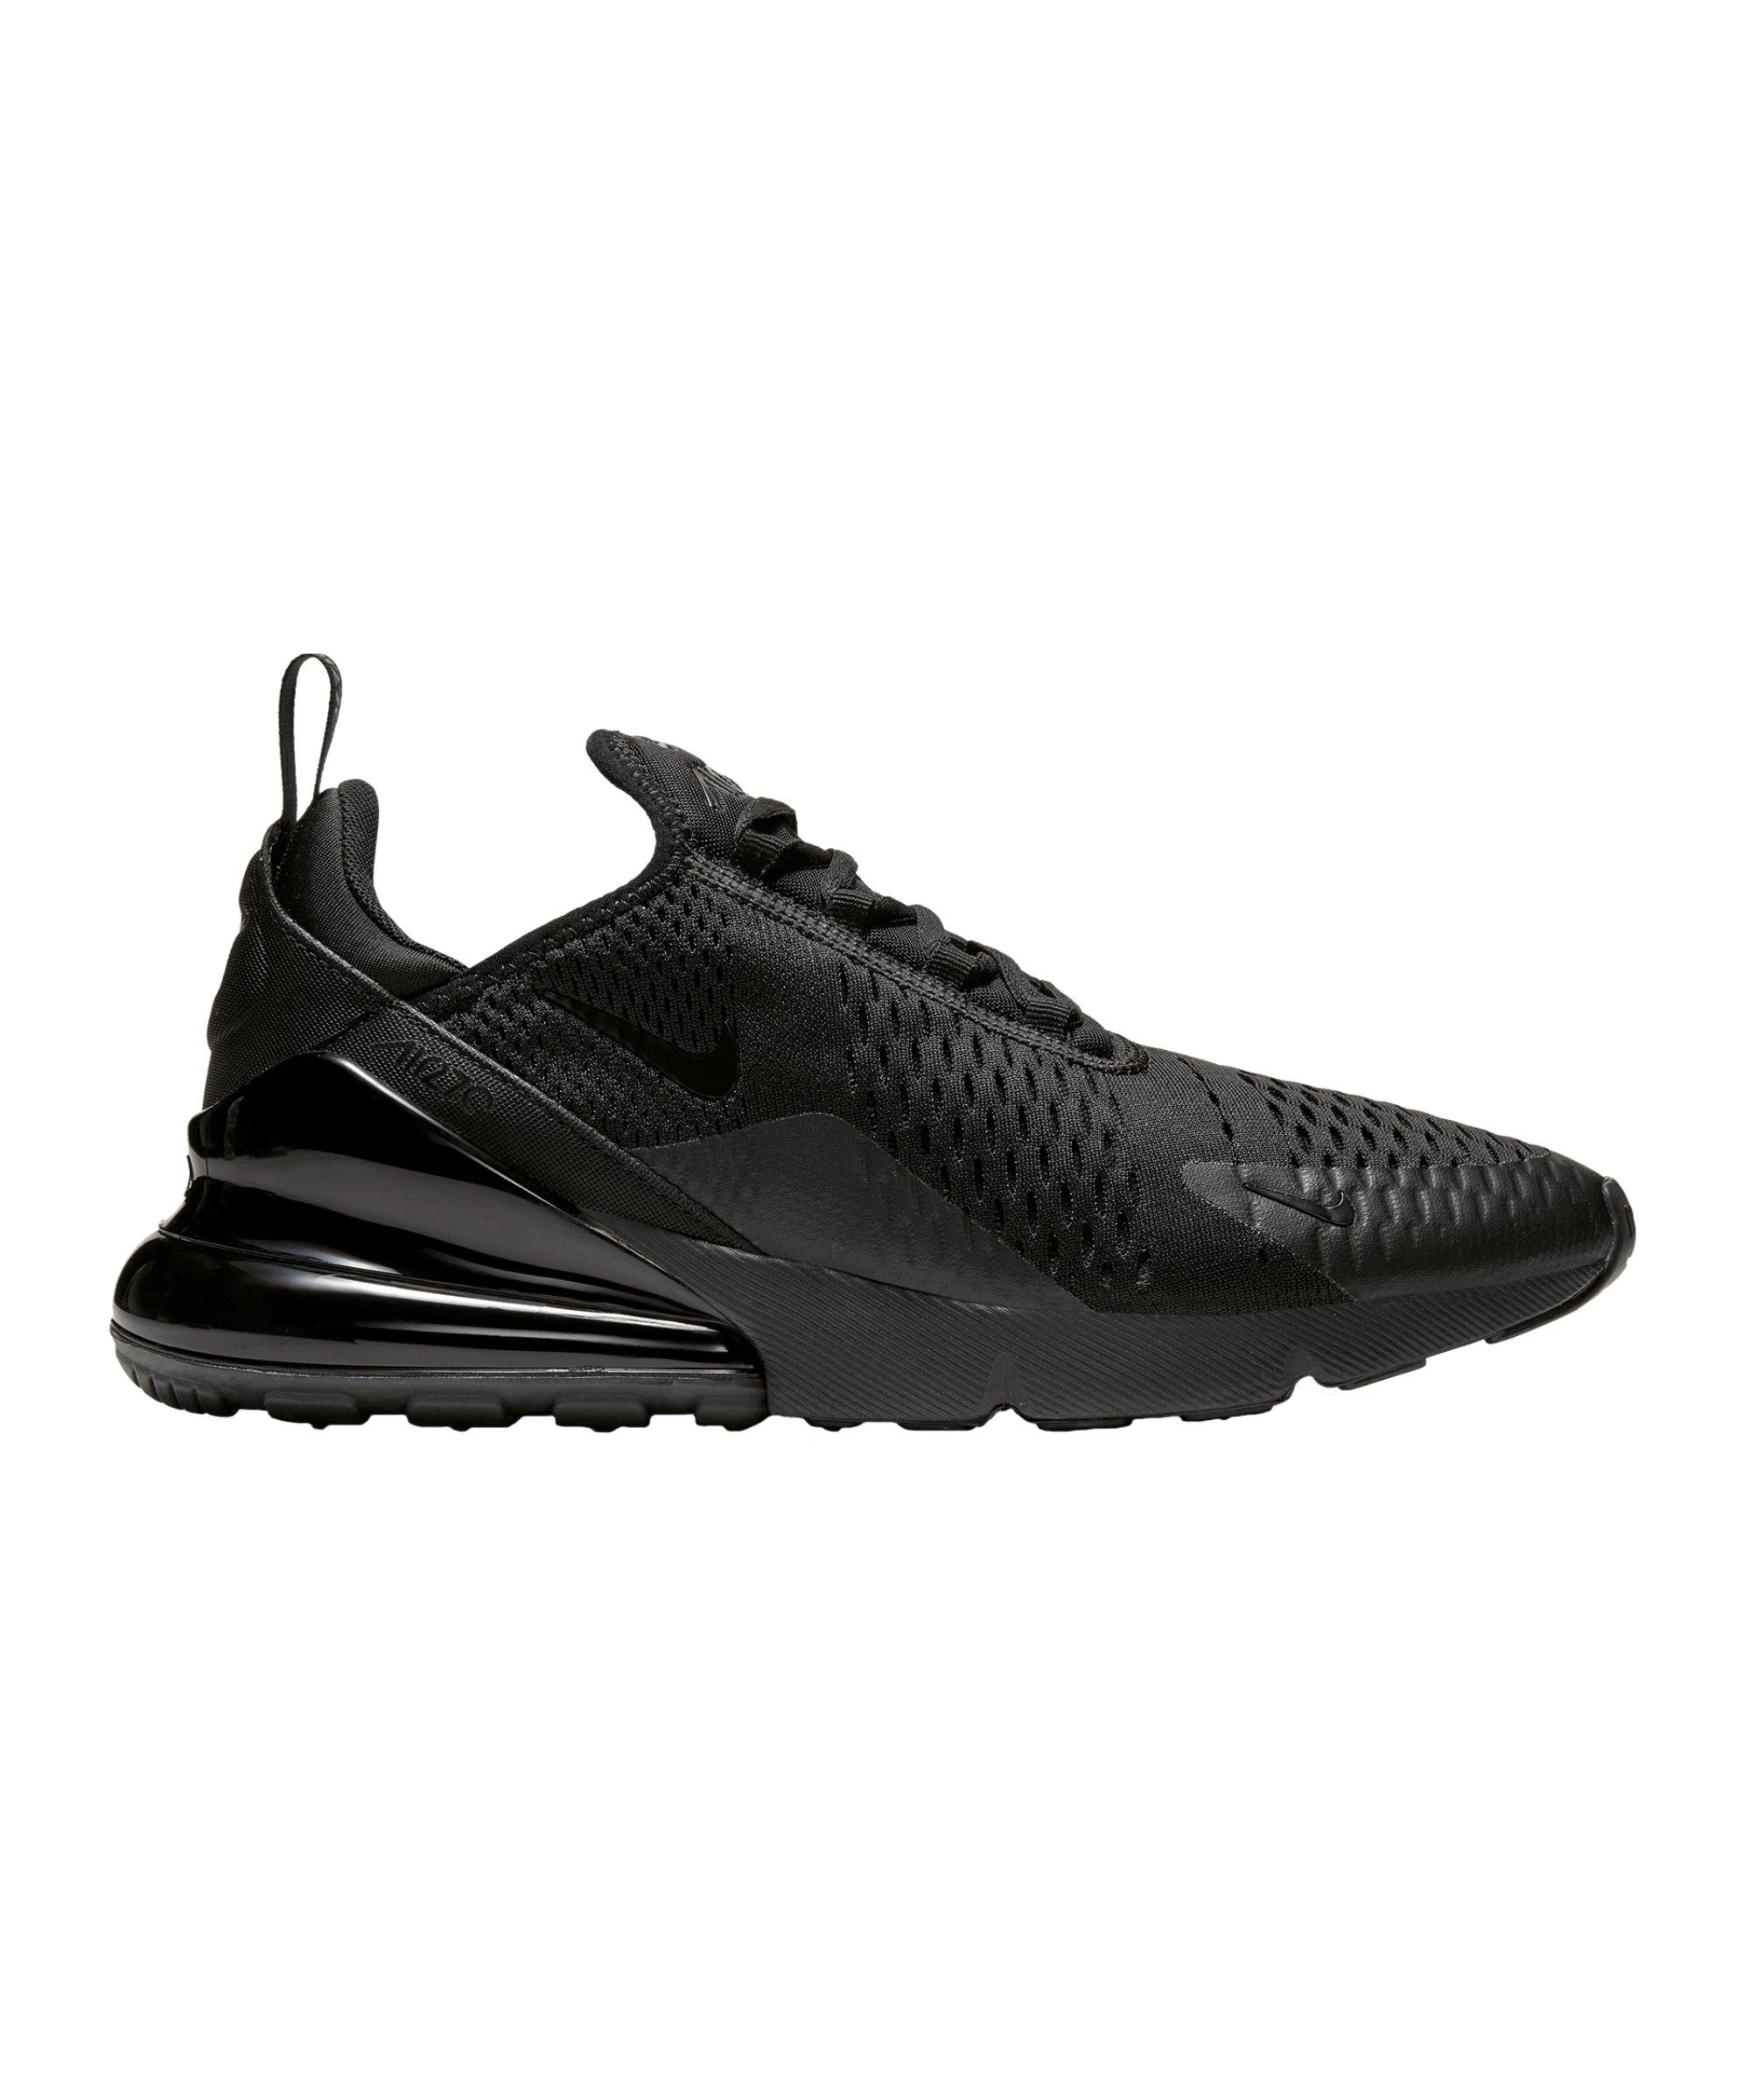 check out 73d48 80739 Nike Air Max 270 Sneaker Schwarz F005   Freizeit   Lifestyle   Strasse    Schuh   10105326